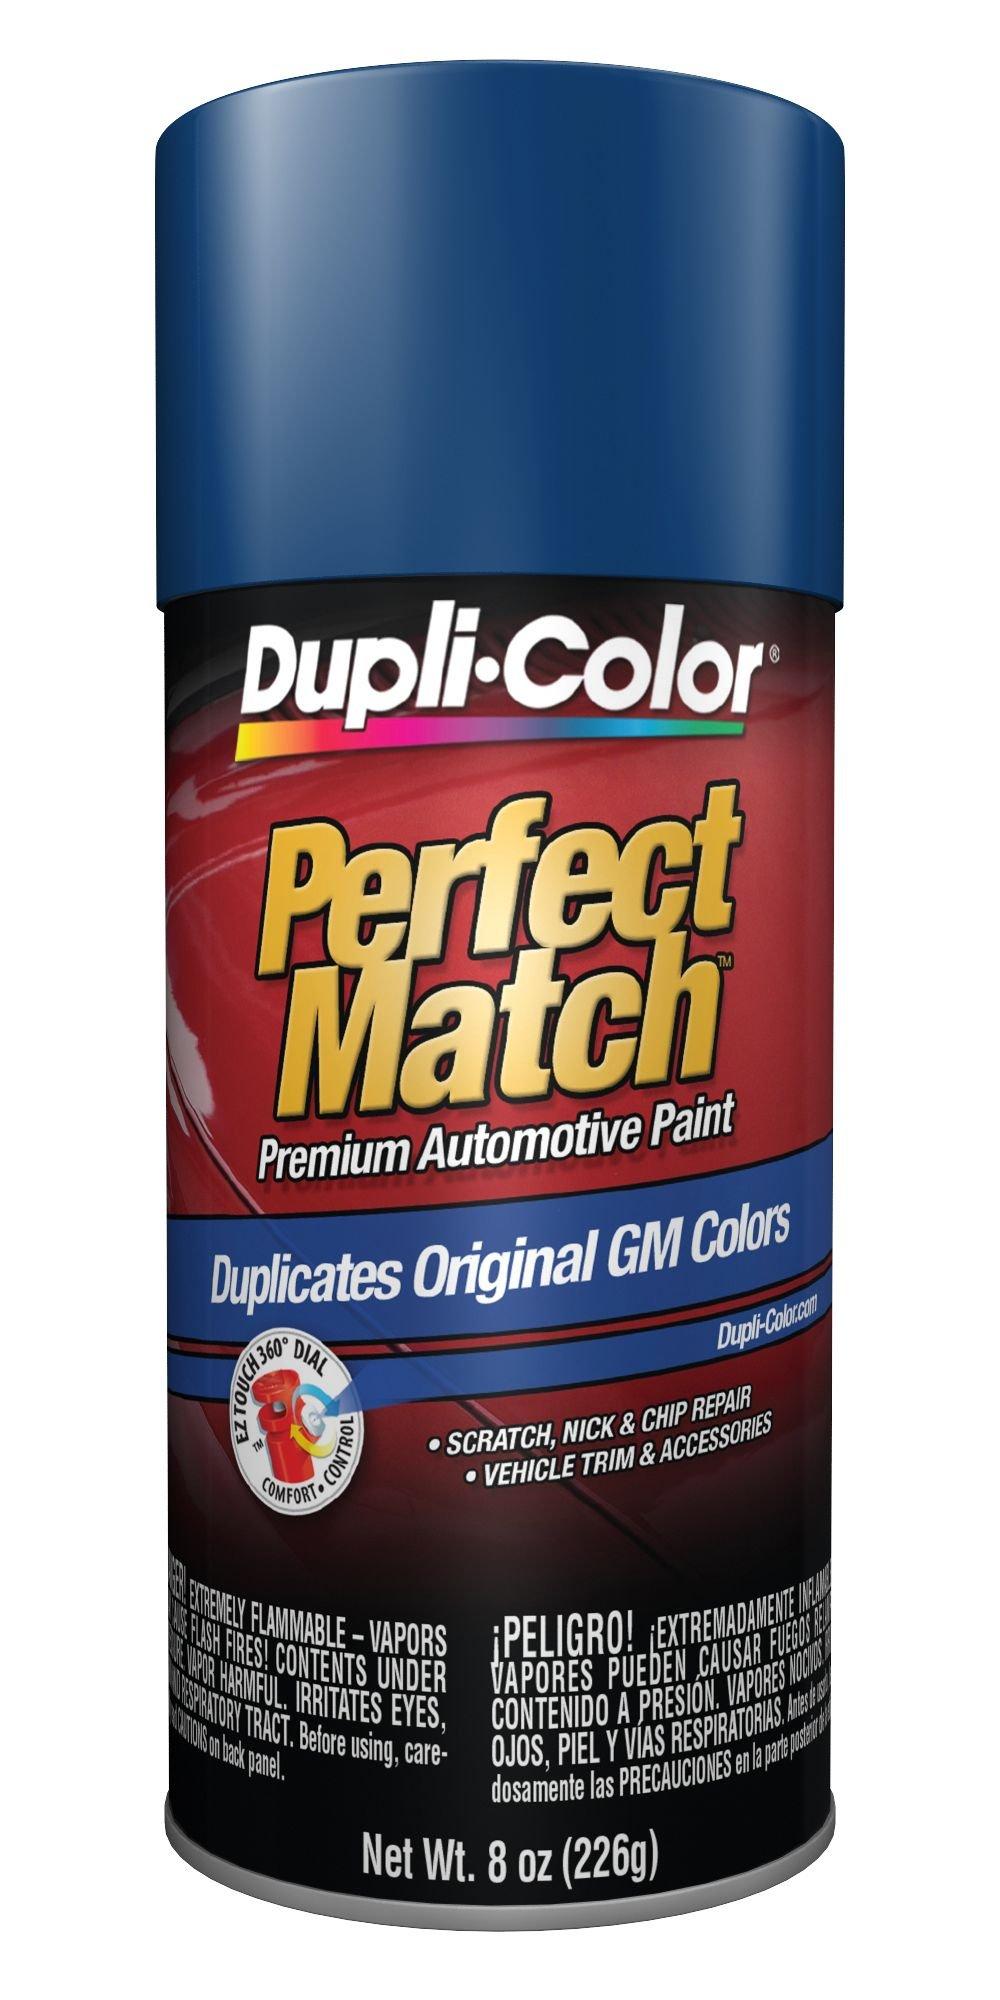 Dupli-Color BGM0505-6PK Exact Match Touch-Up Paint - 8 fl. oz, (Pack of 6) by Dupli-Color (Image #1)